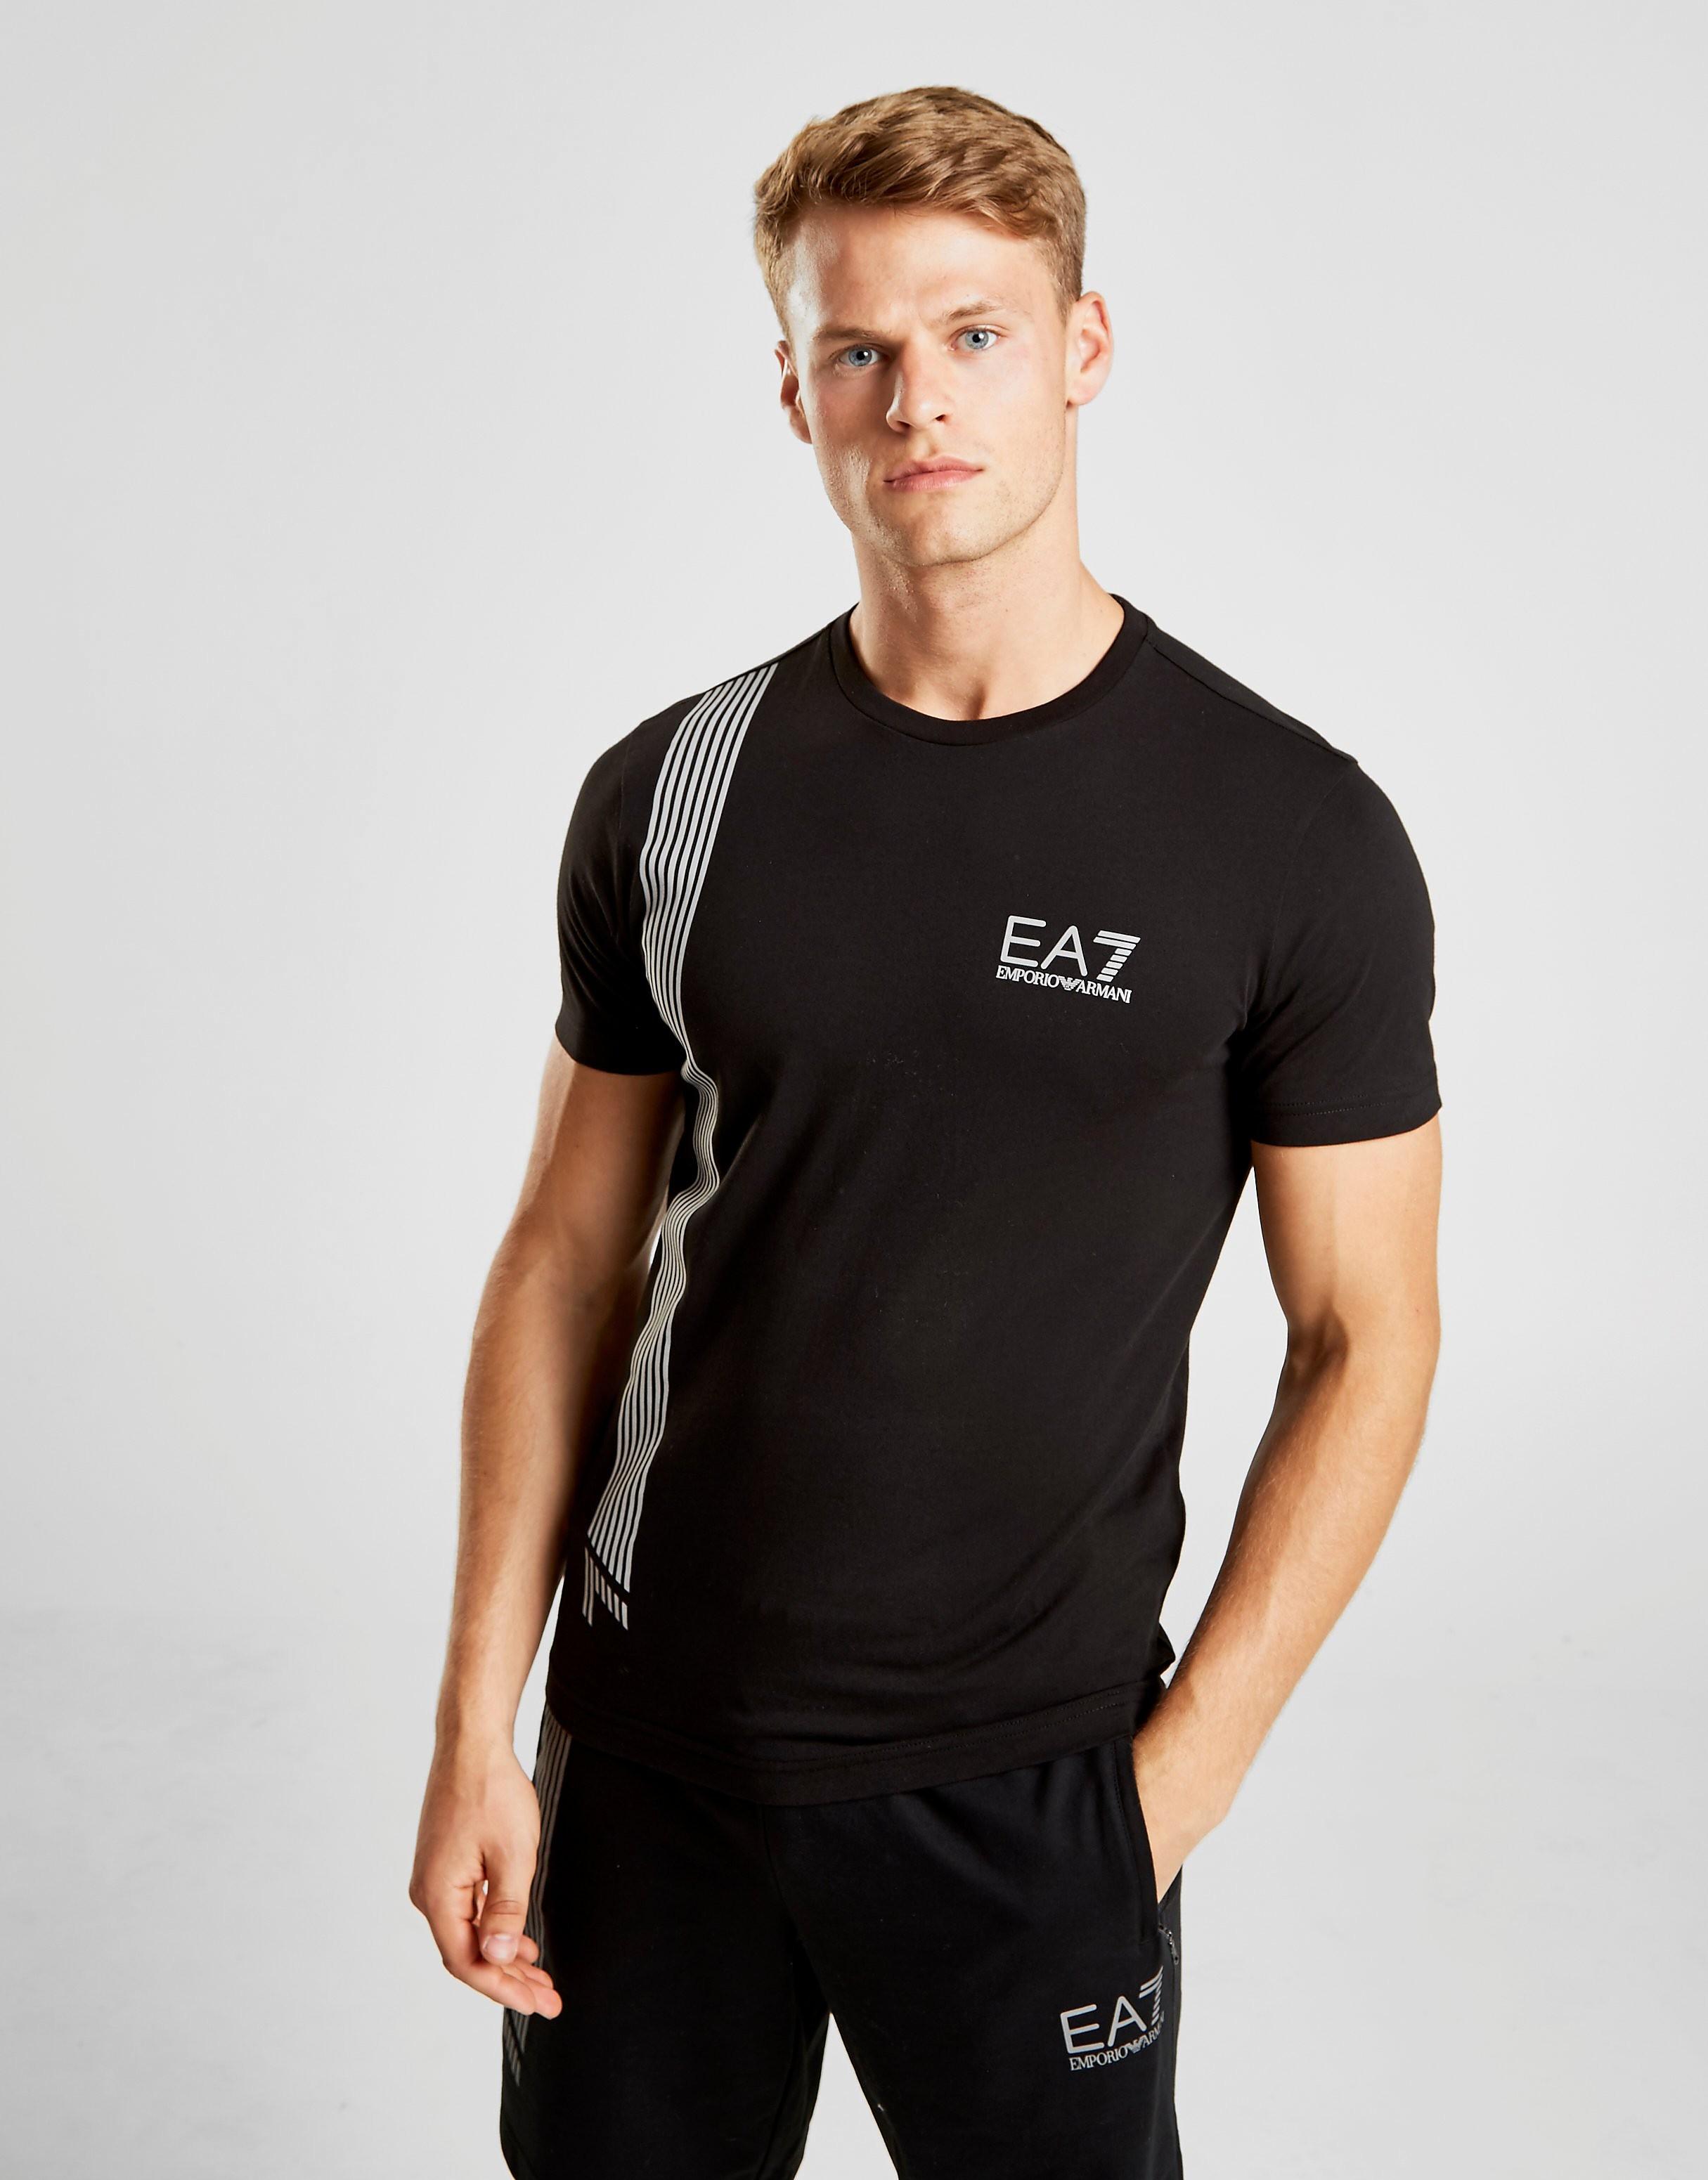 Emporio Armani EA7 7 Lines Short Sleeve T-Shirt Heren